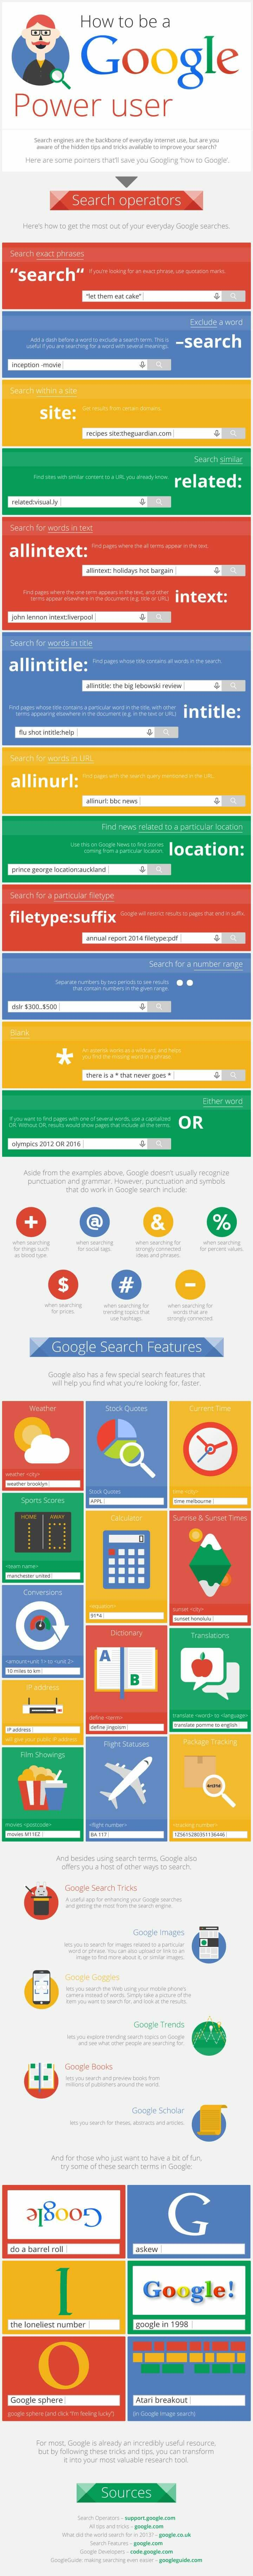 Google PowerUser